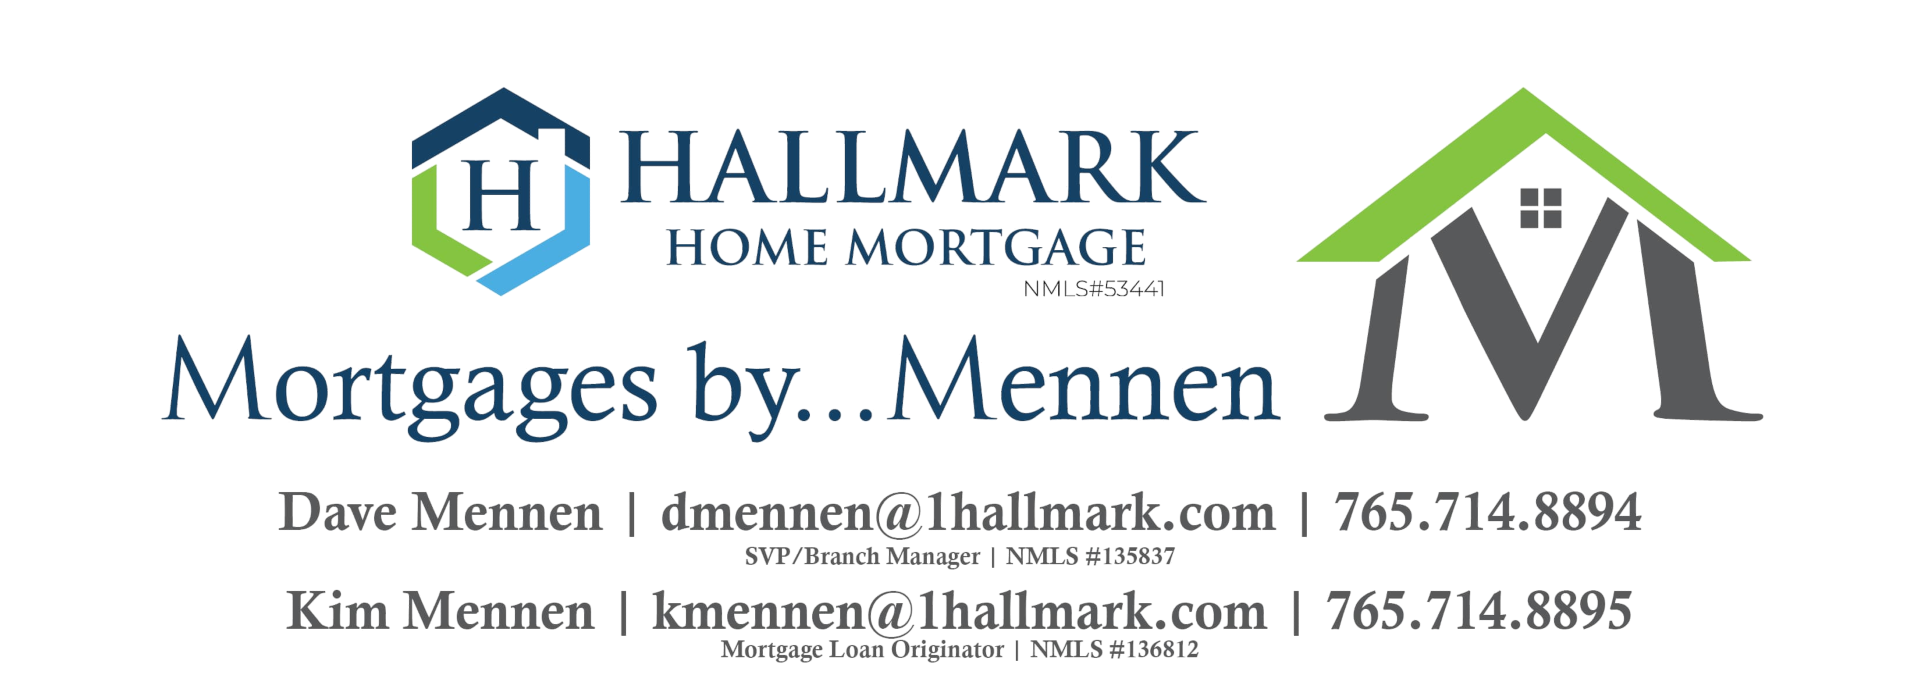 Hallmark Home Mortgage By Mennen